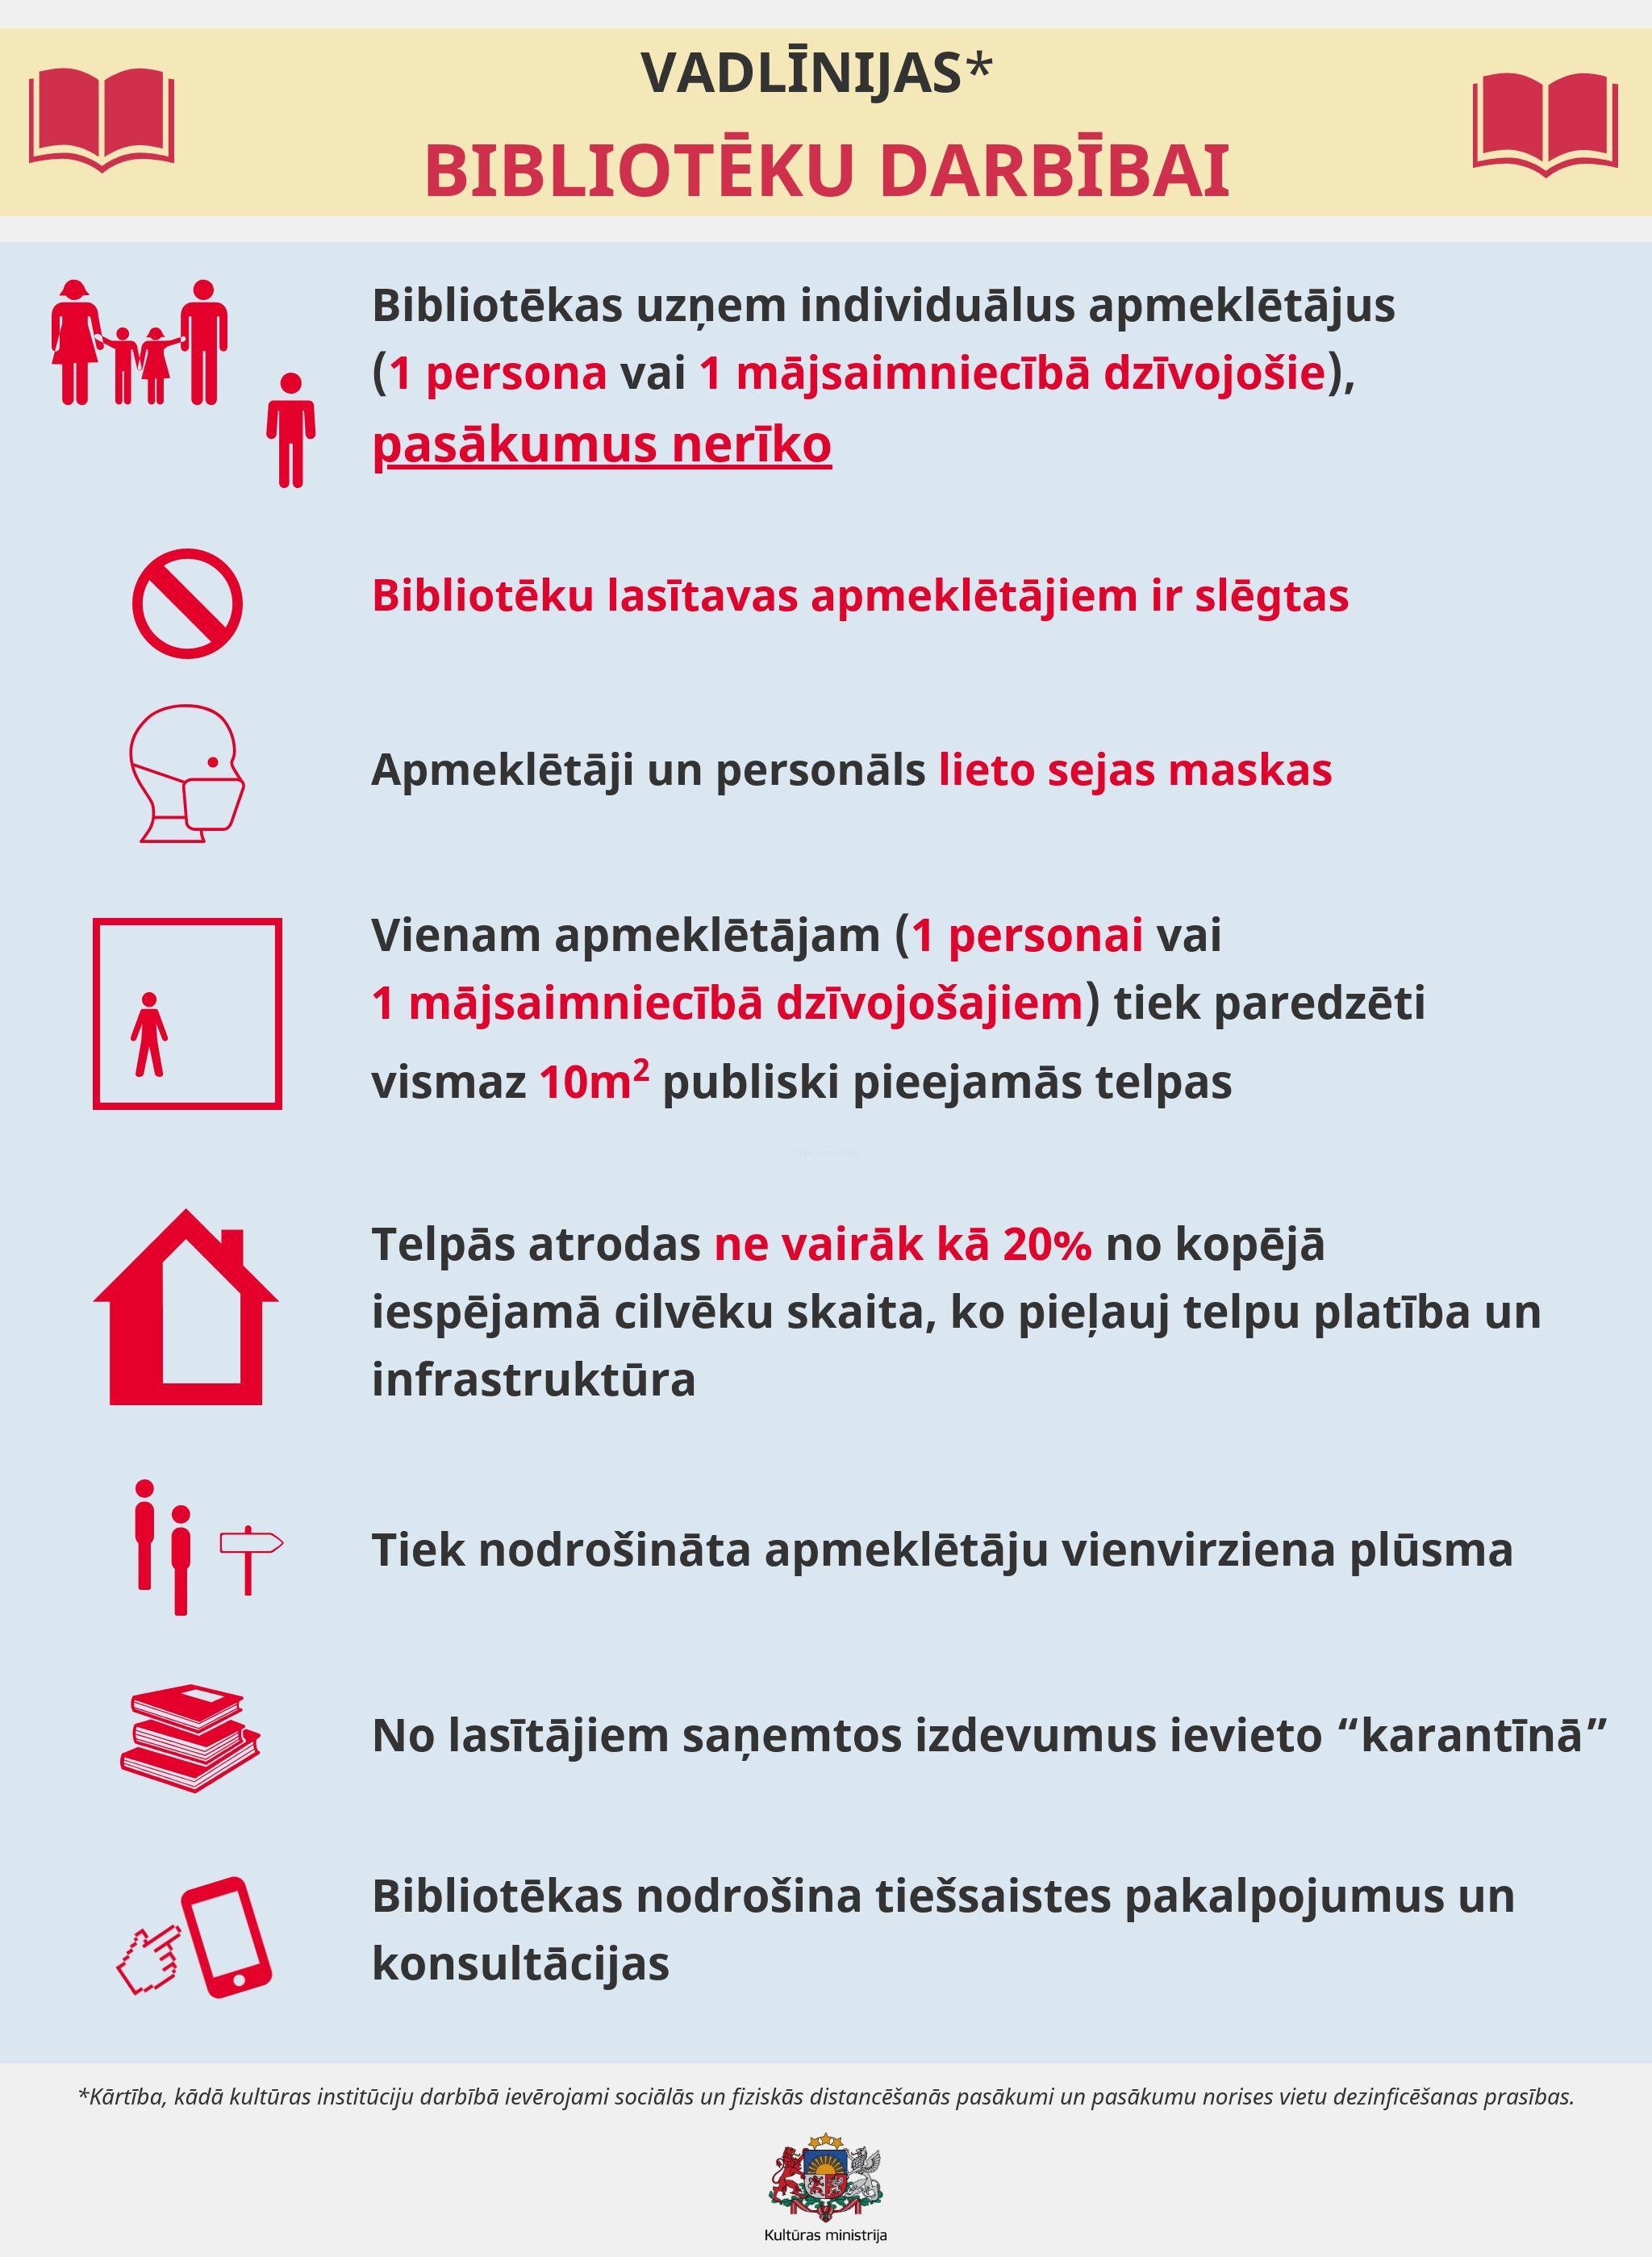 http://www.balvurcb.lv/cb/images/aktualitates/biblioteku-darbiba_vadlinijas_070121.jpeg